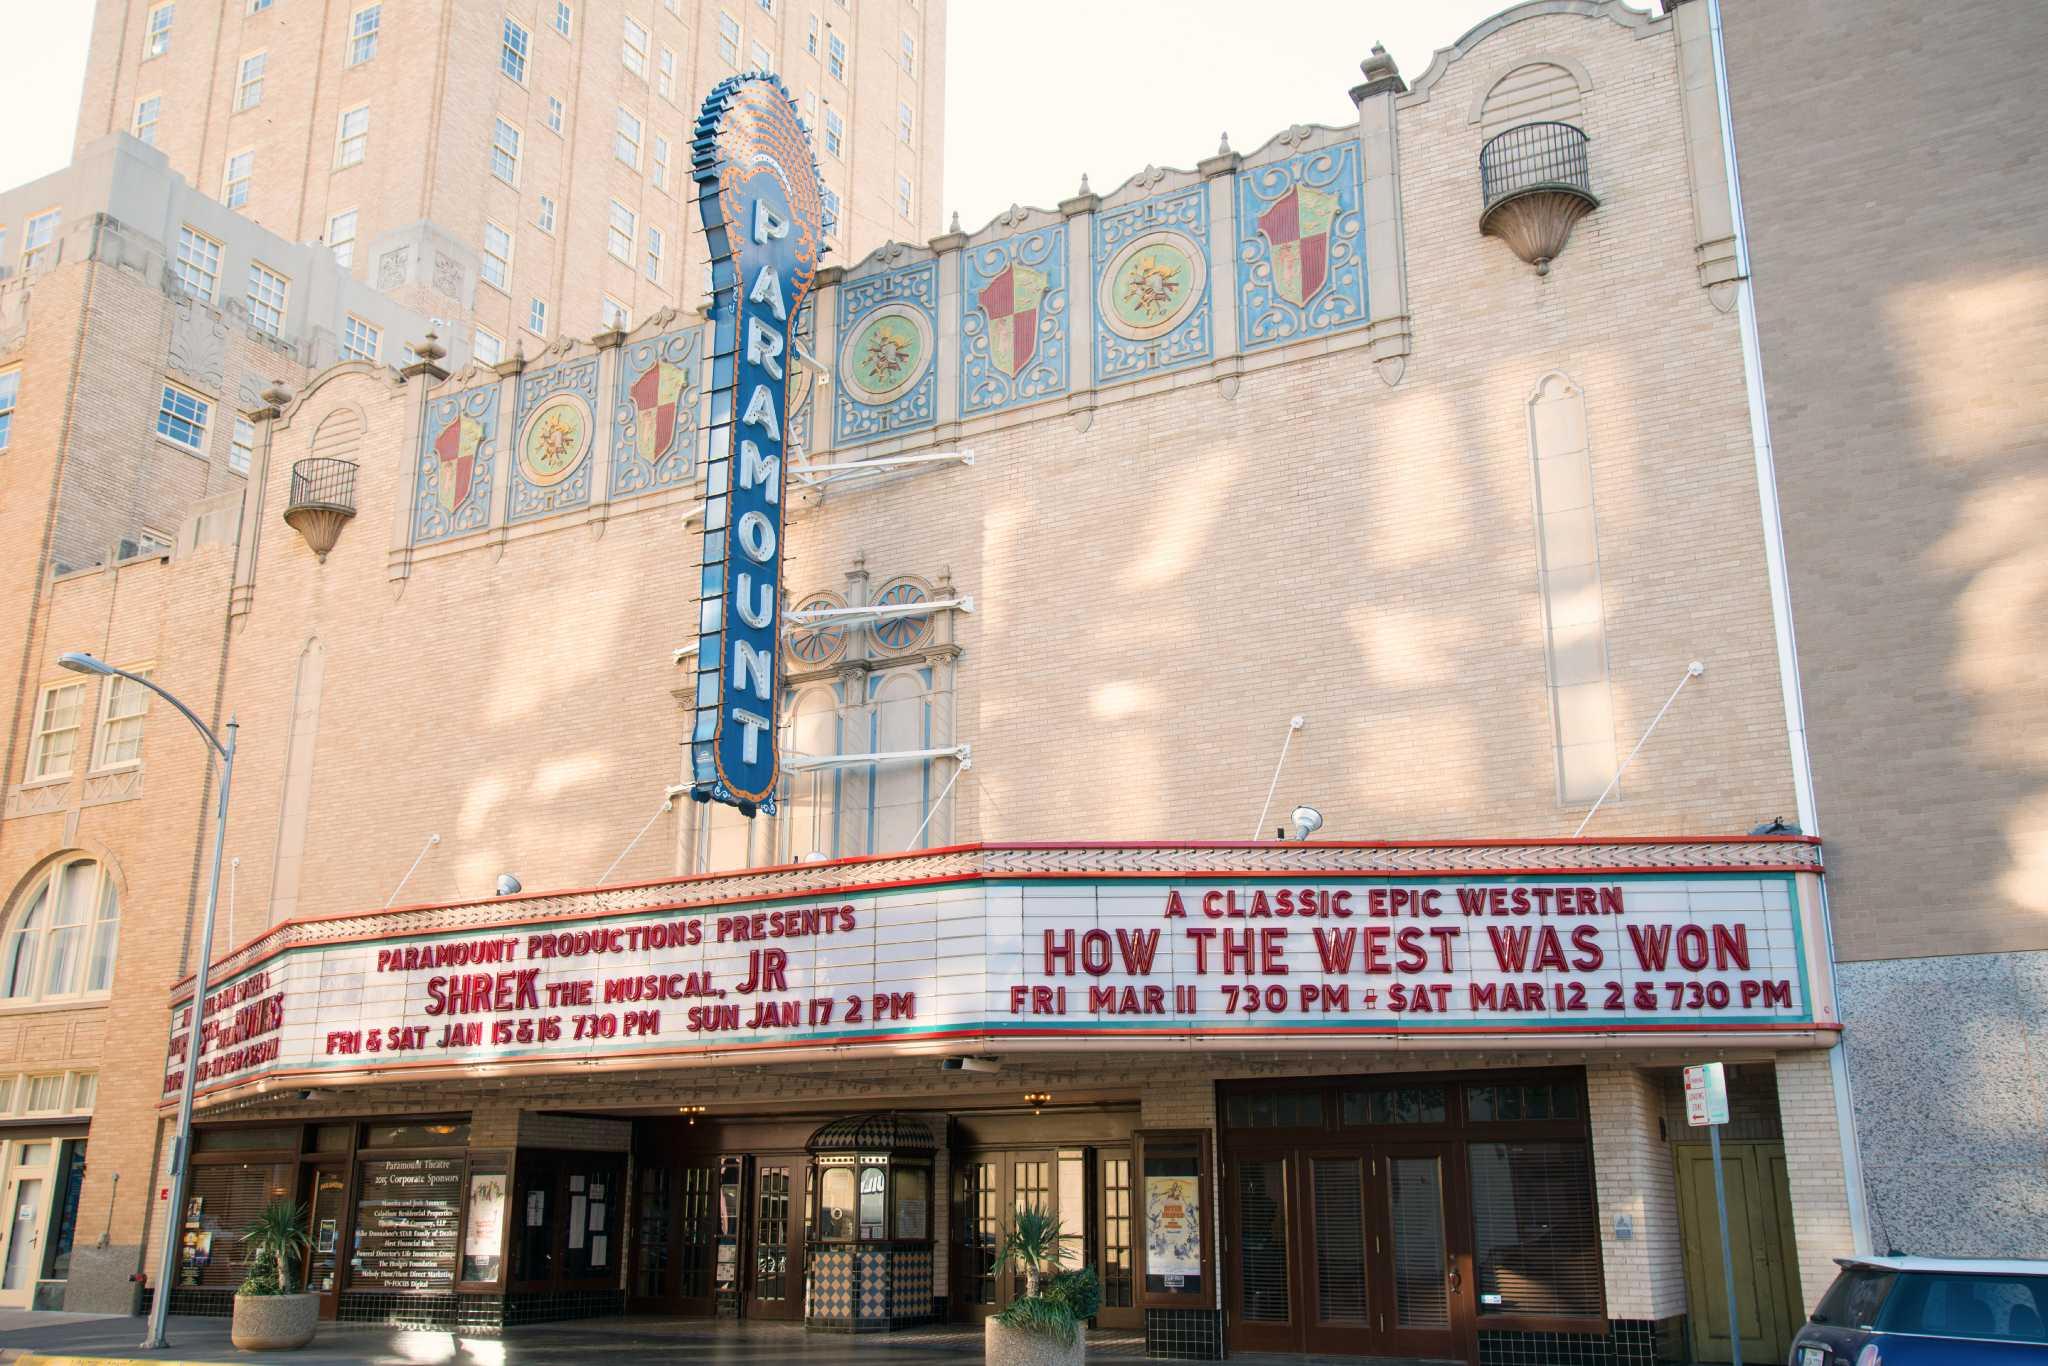 10 Things To Do In Abilene For 2016 Houstonchronicle Com